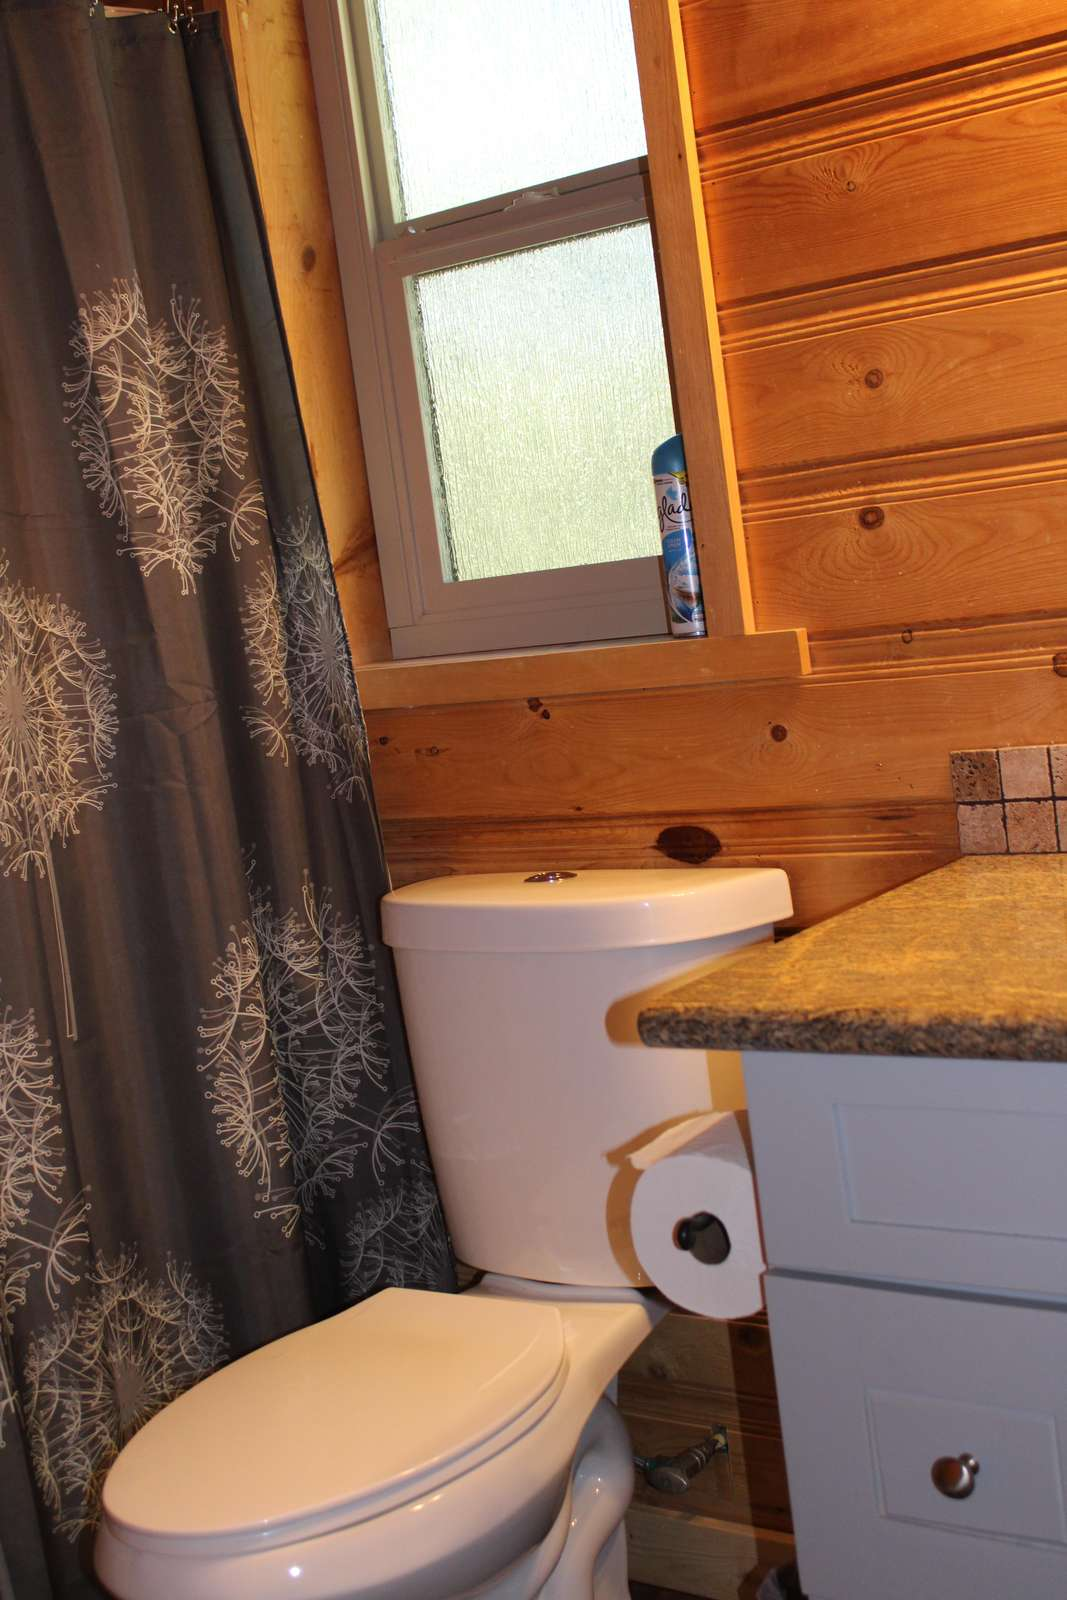 Full bathroom: Tub & Shower upstairs